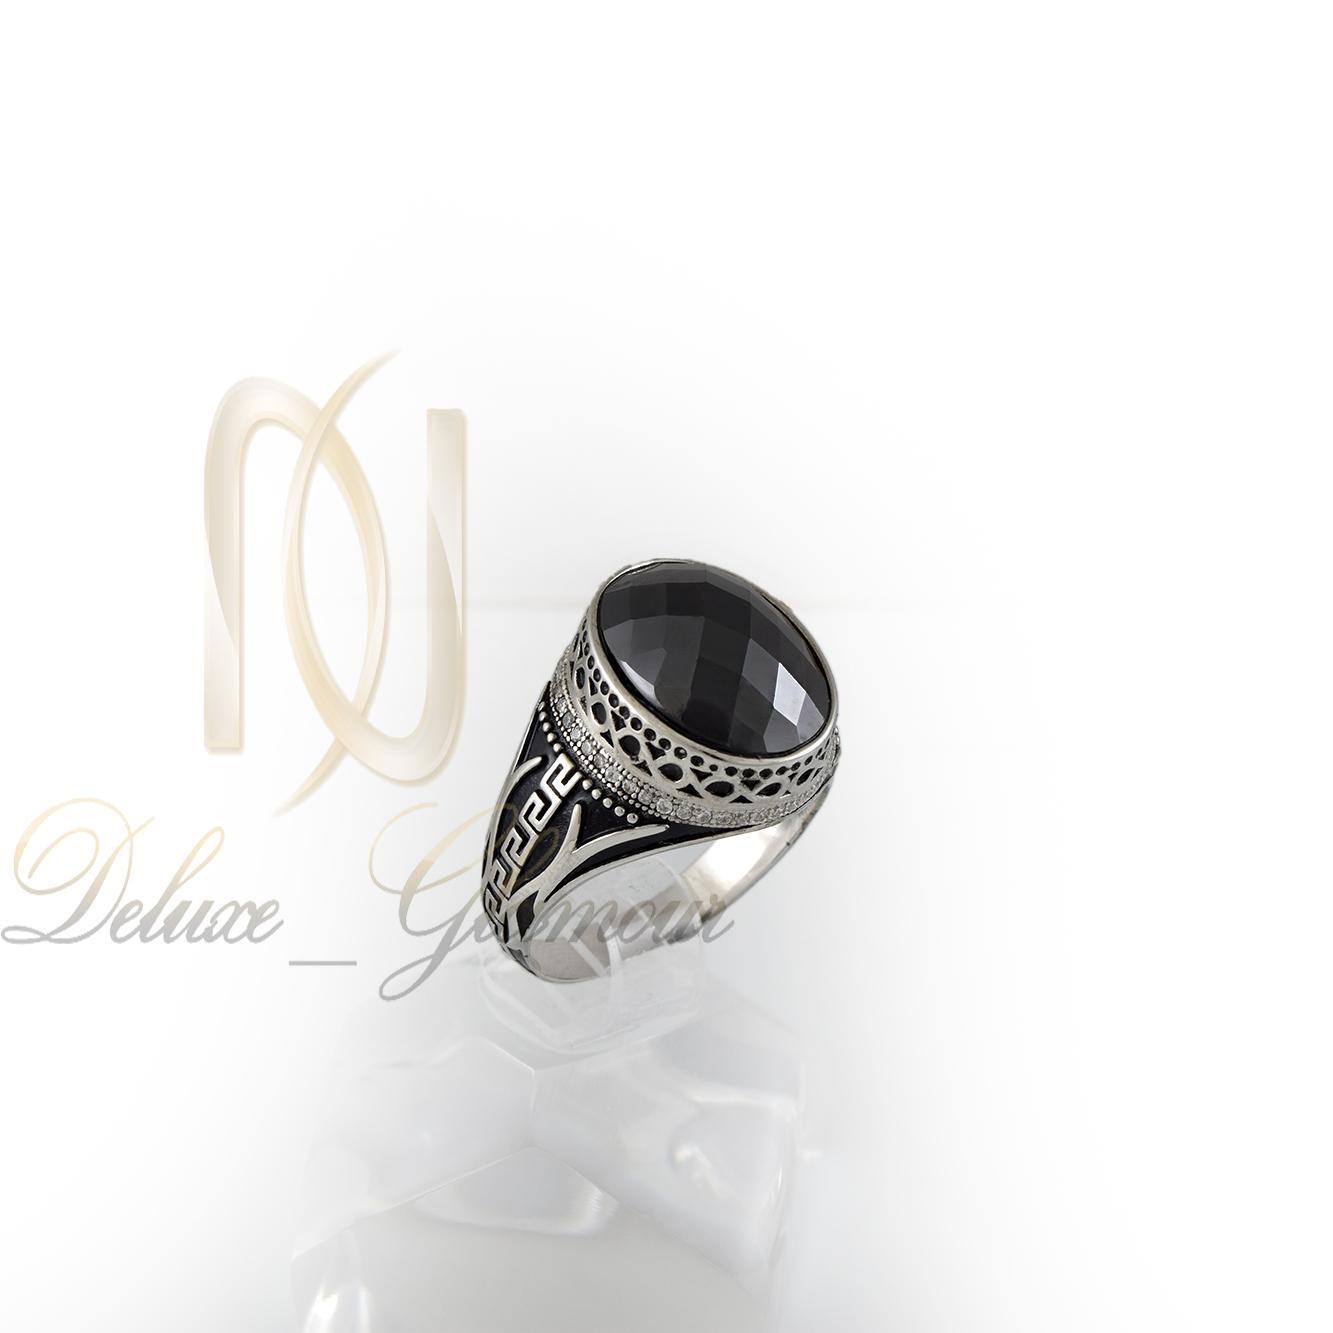 انگشتر نقره مردانه طرح ورساچه rg-n333 از نماي روبرو